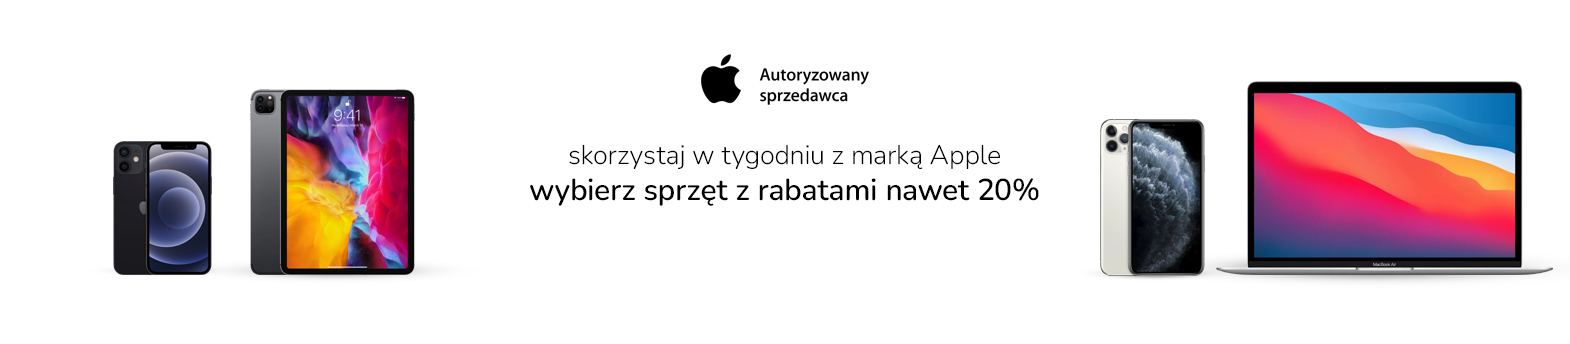 Tydzień Apple